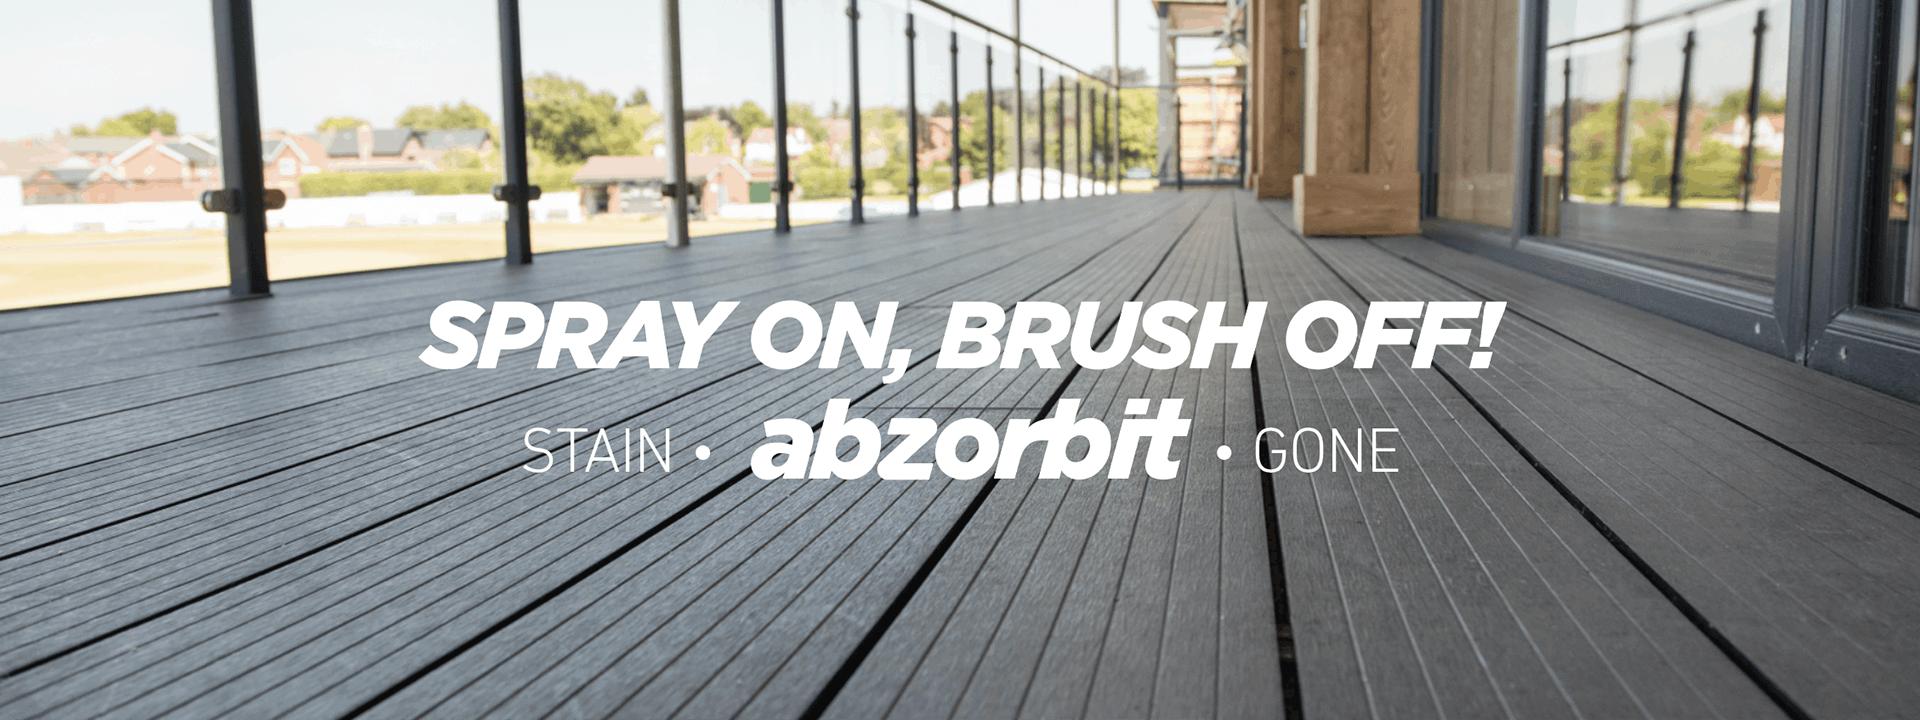 Spray On, Brush Off, Stain Abzorbit Gone